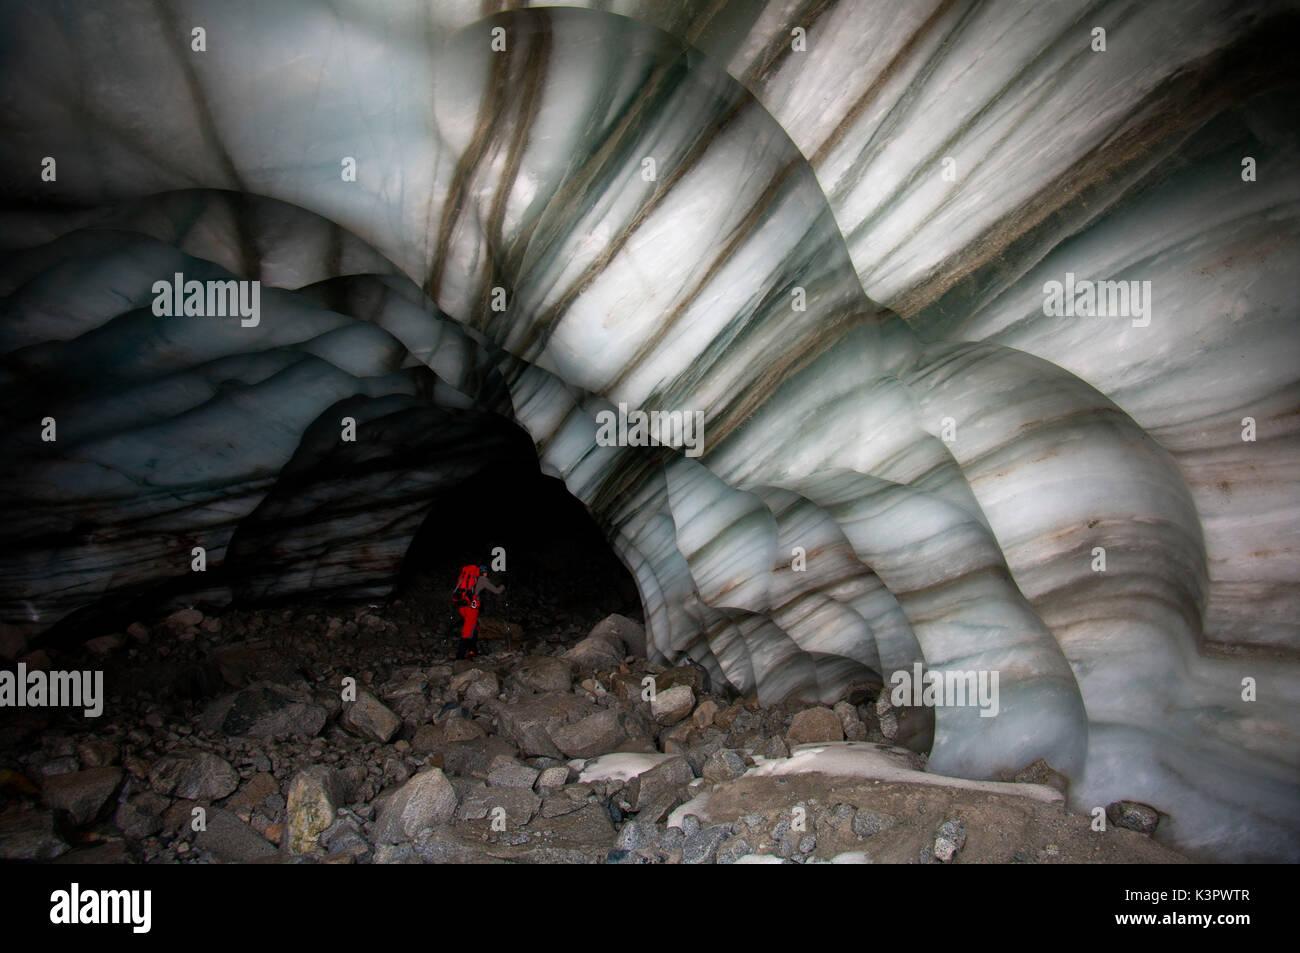 Stratified ice, Venerocolo glacier, Adamello massif, Valcamonica, Lombardy, Italy - Stock Image